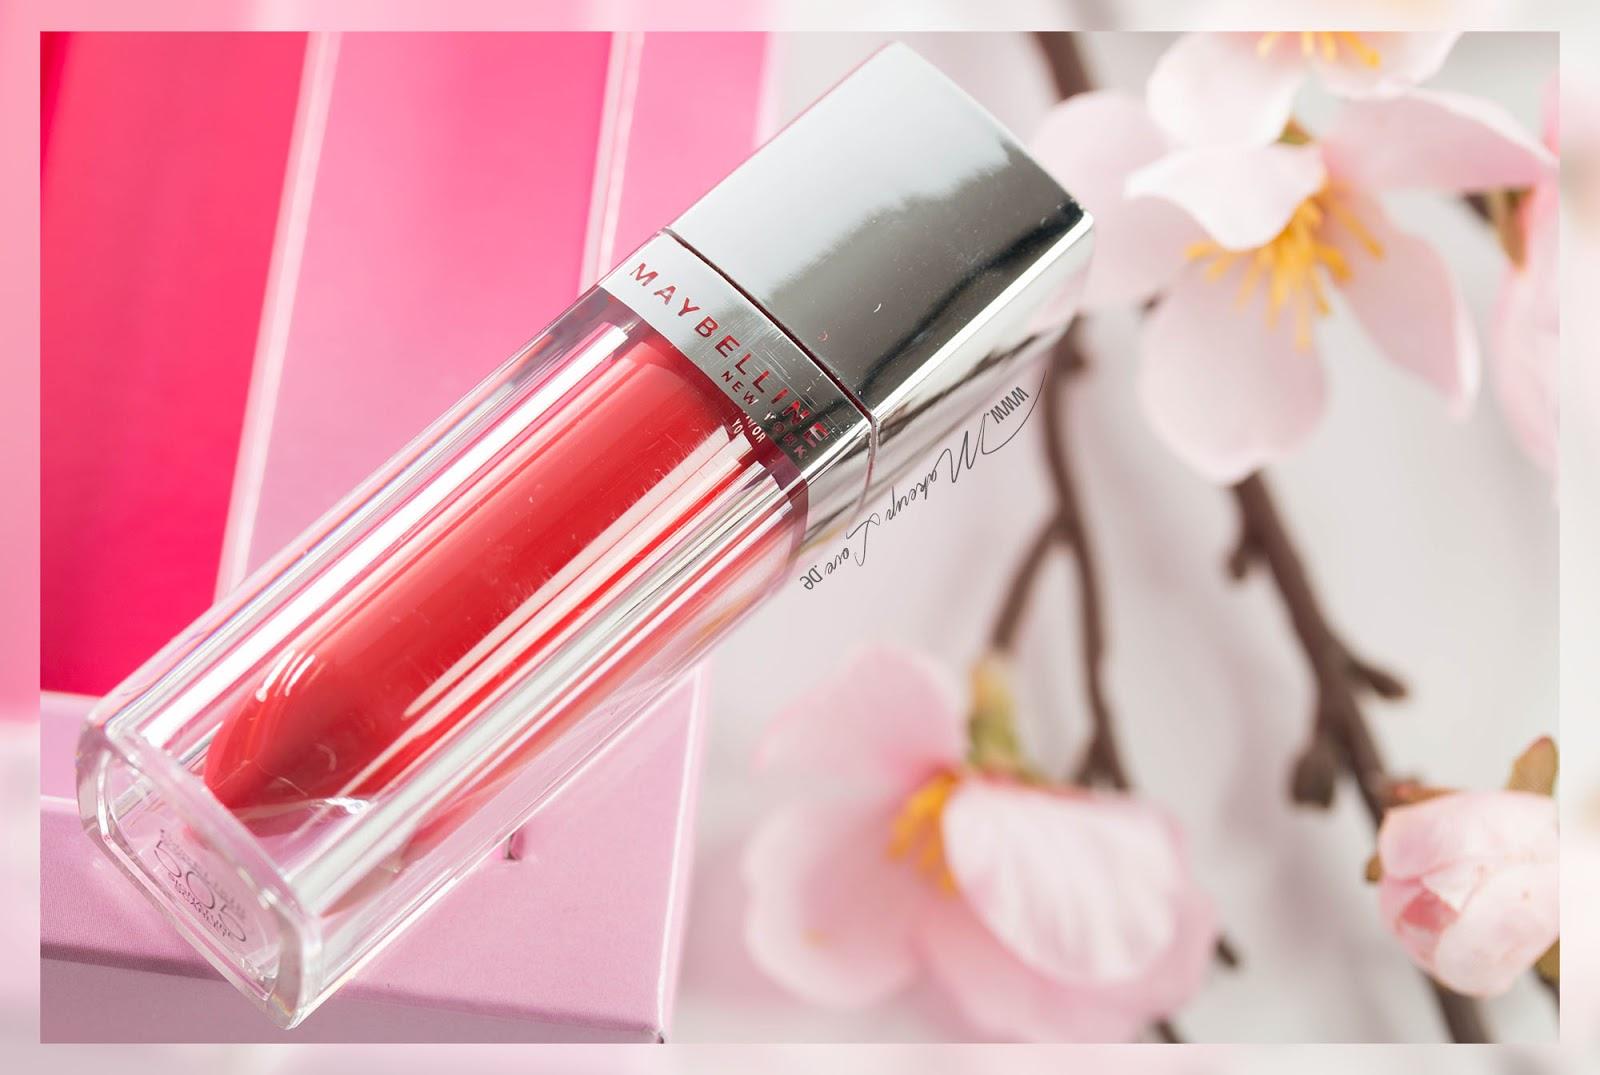 Maybelline Color Elixir Signatur Scarlet